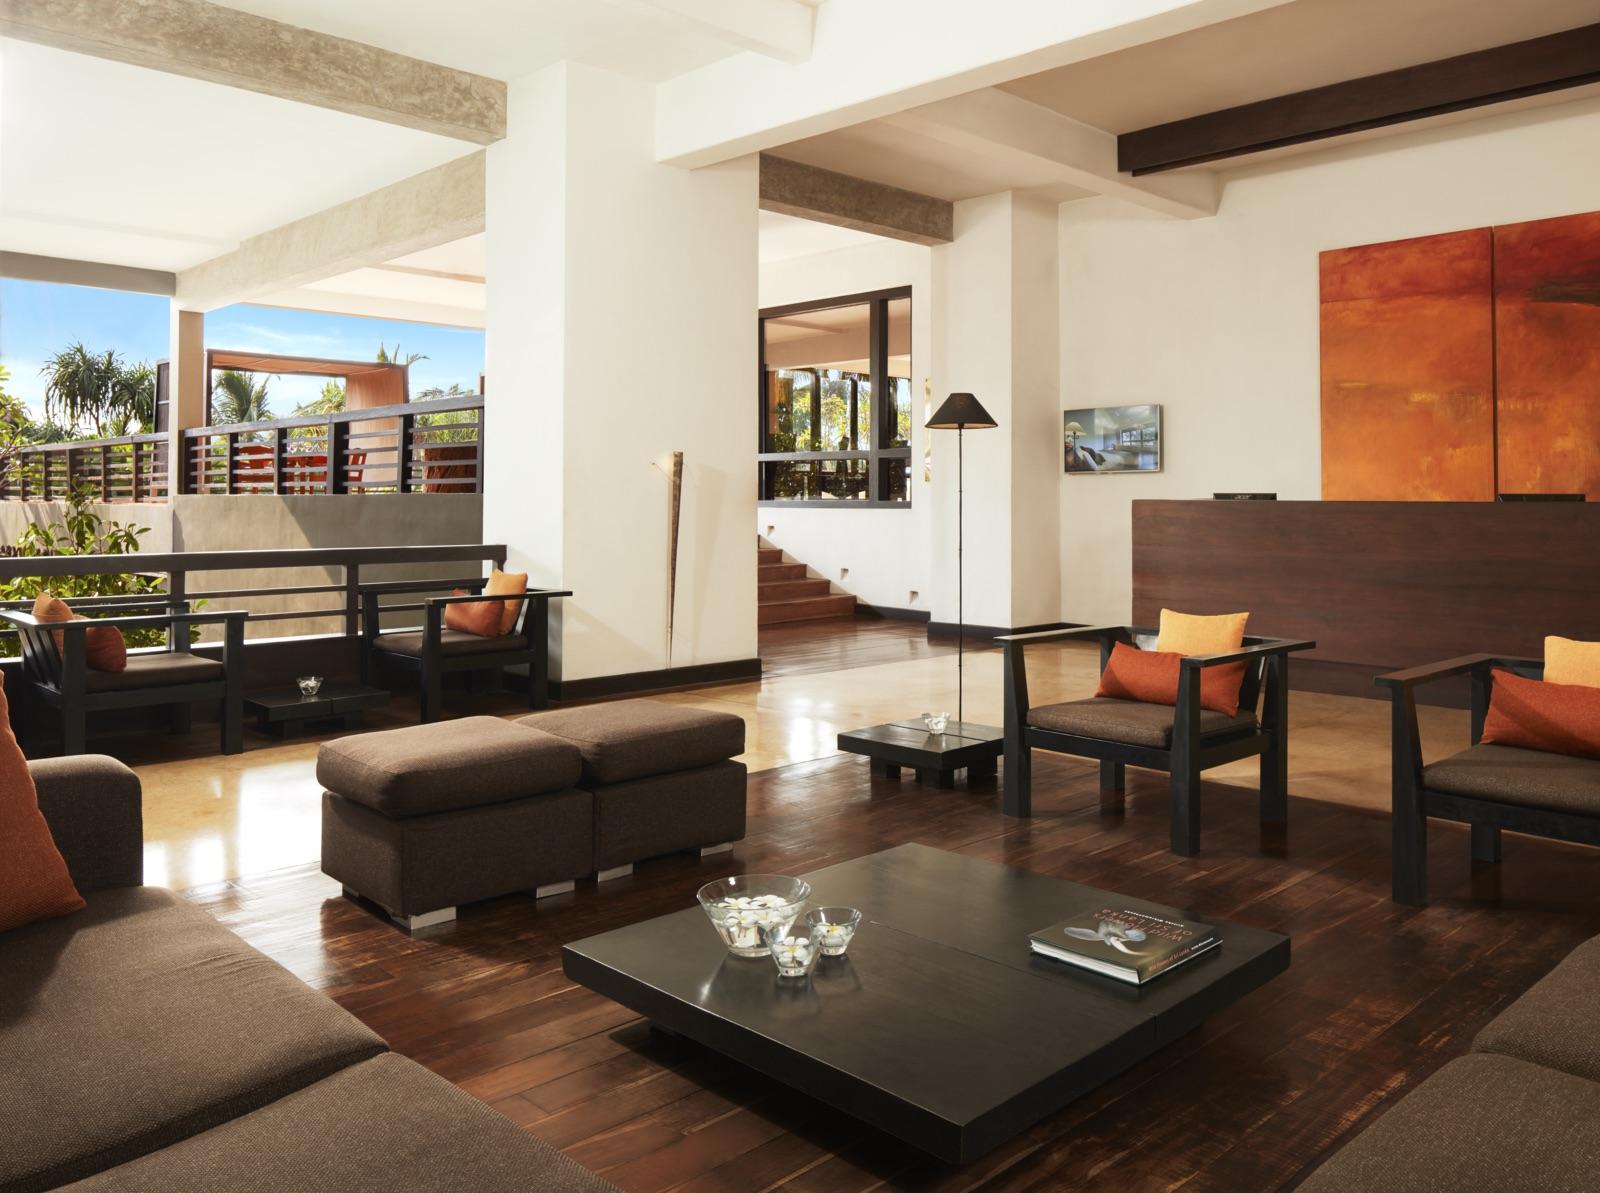 invite-to-paradise-sri-lanka-specialists-experts-travel-agent-tour-operator-jetwing-beach-hotel-negombo-lobby.jpg